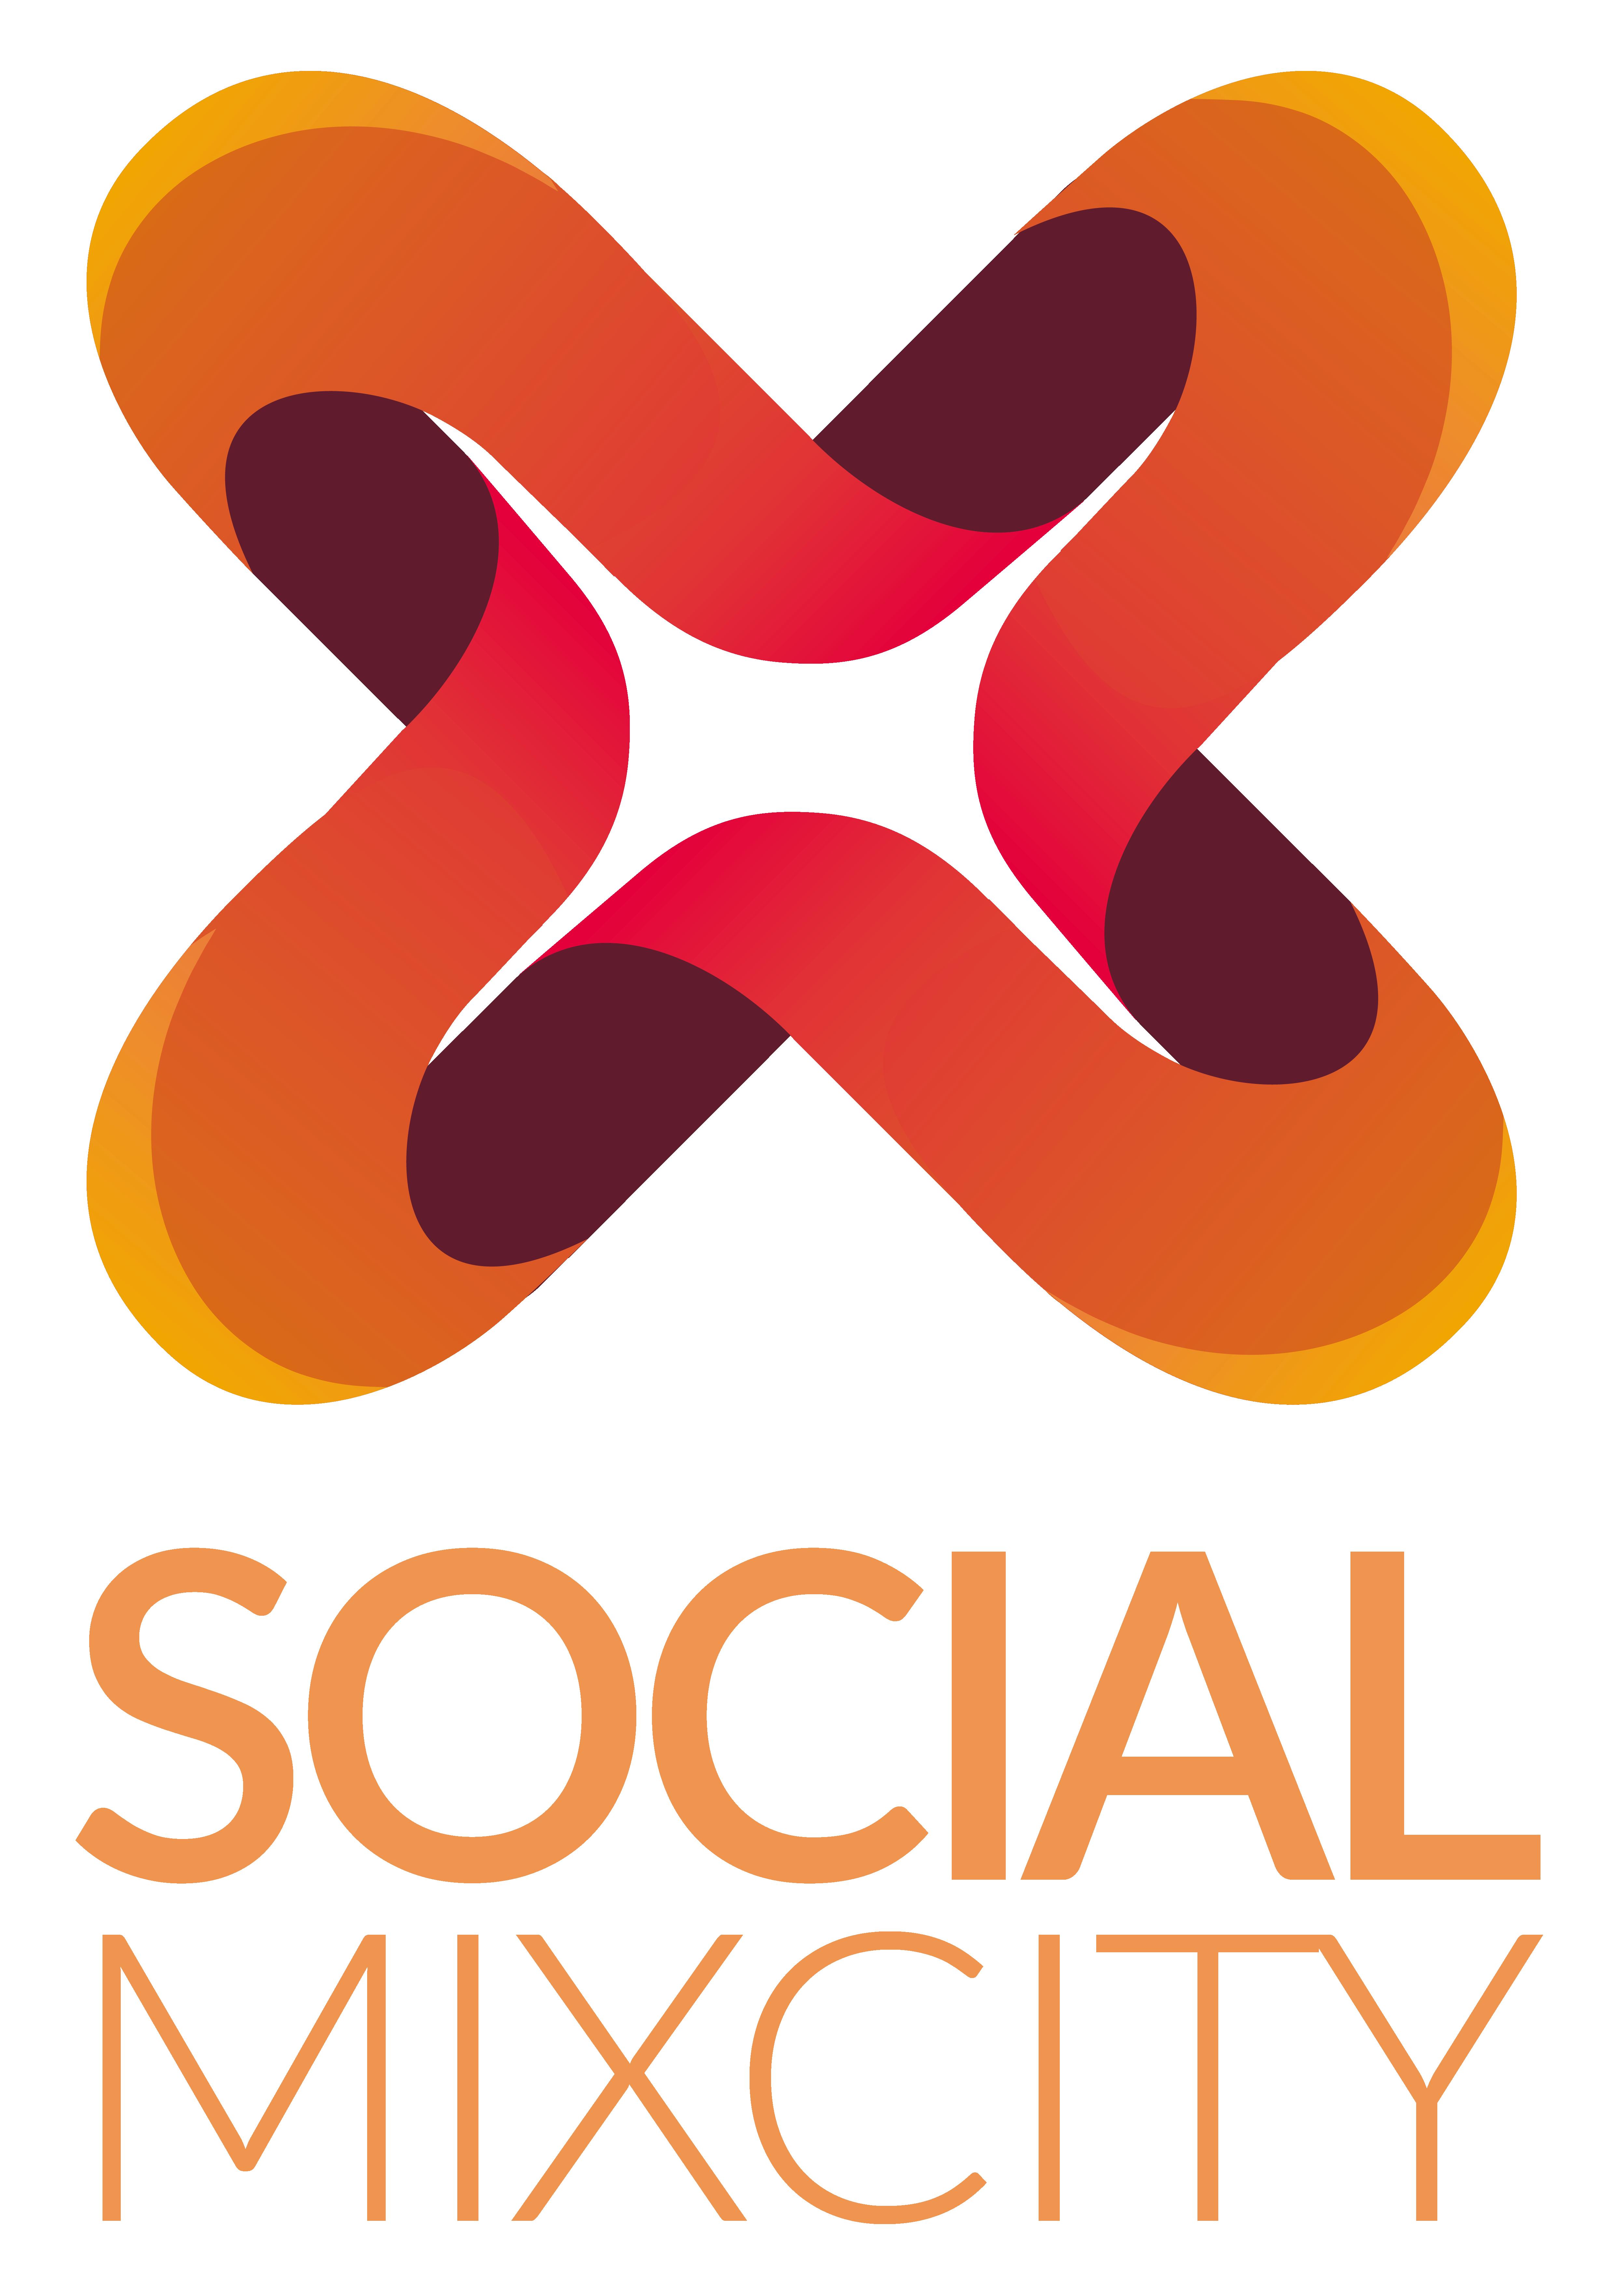 Social Mixcity